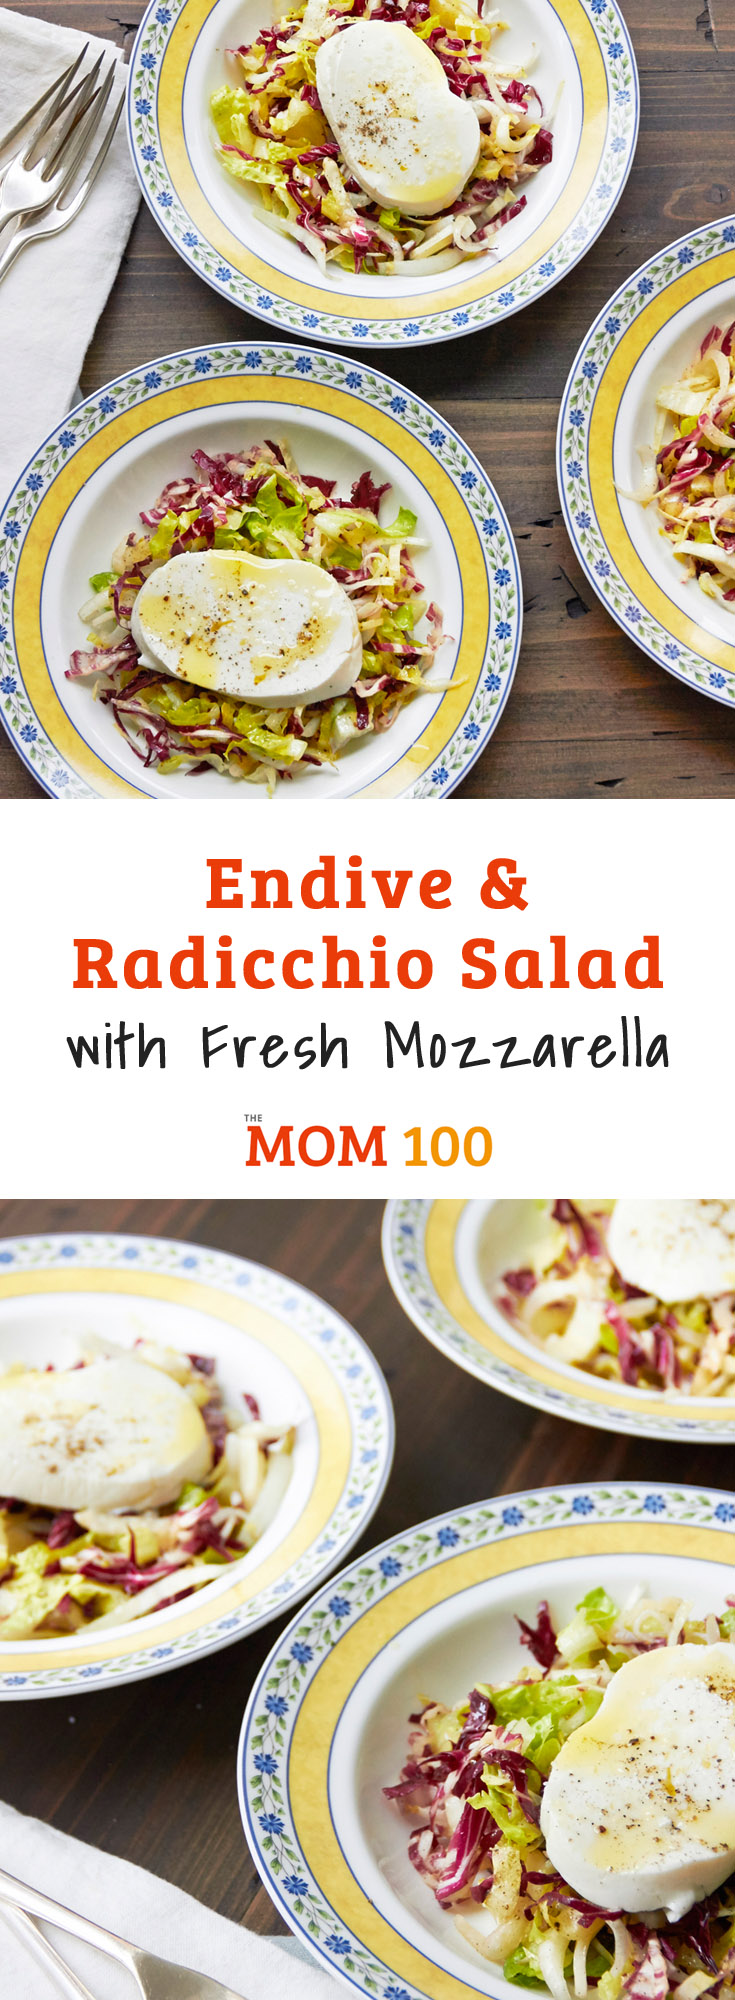 Endive and Radicchio Salad with Fresh Mozzarella